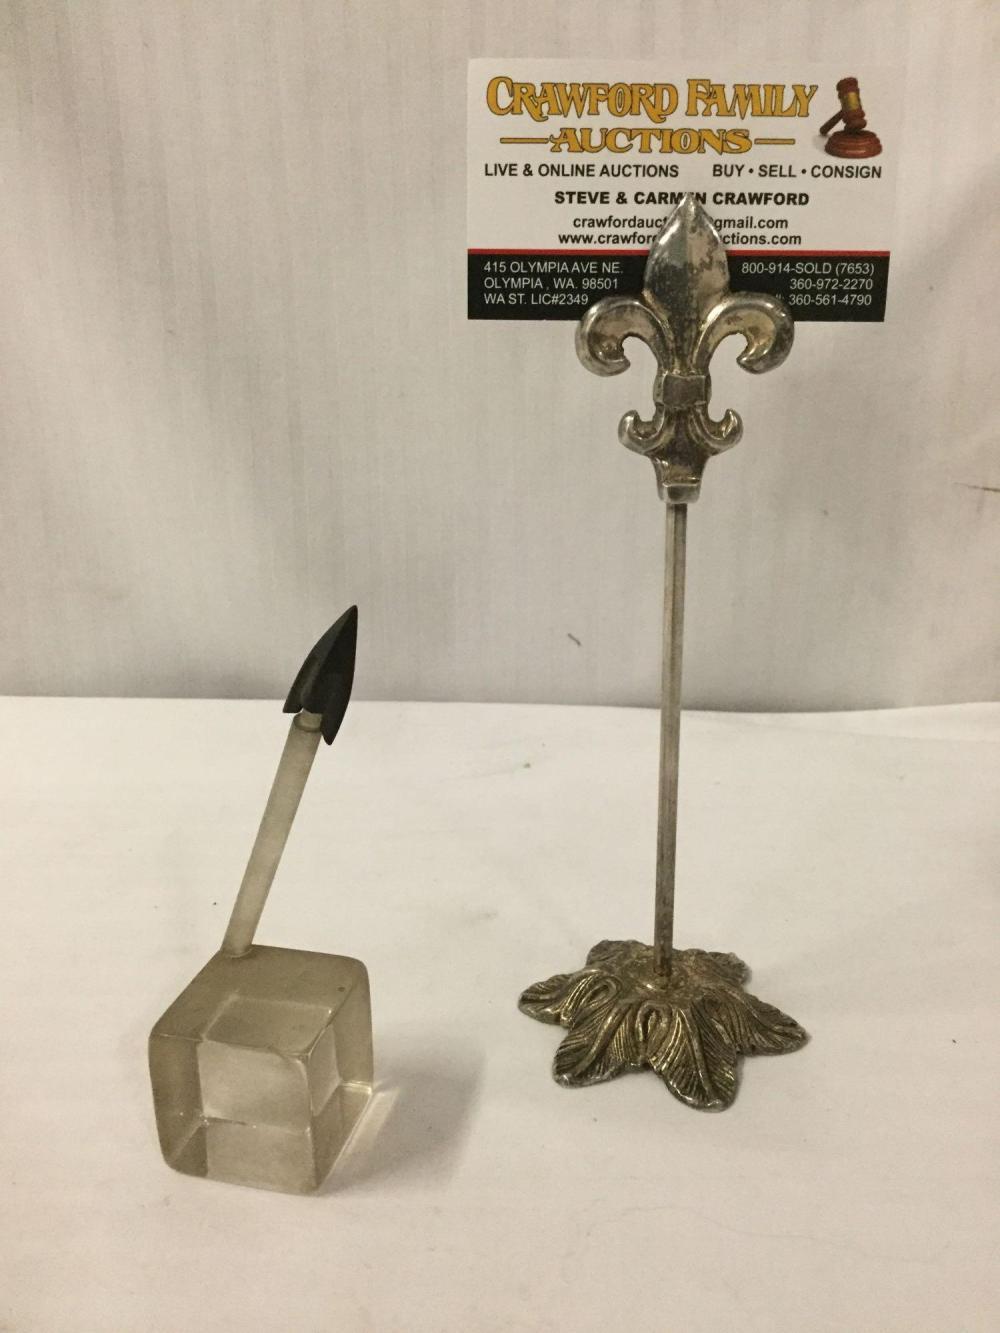 Lot 98: Antique Iron arrowhead having a raised mid-rib, includes plastic display stand